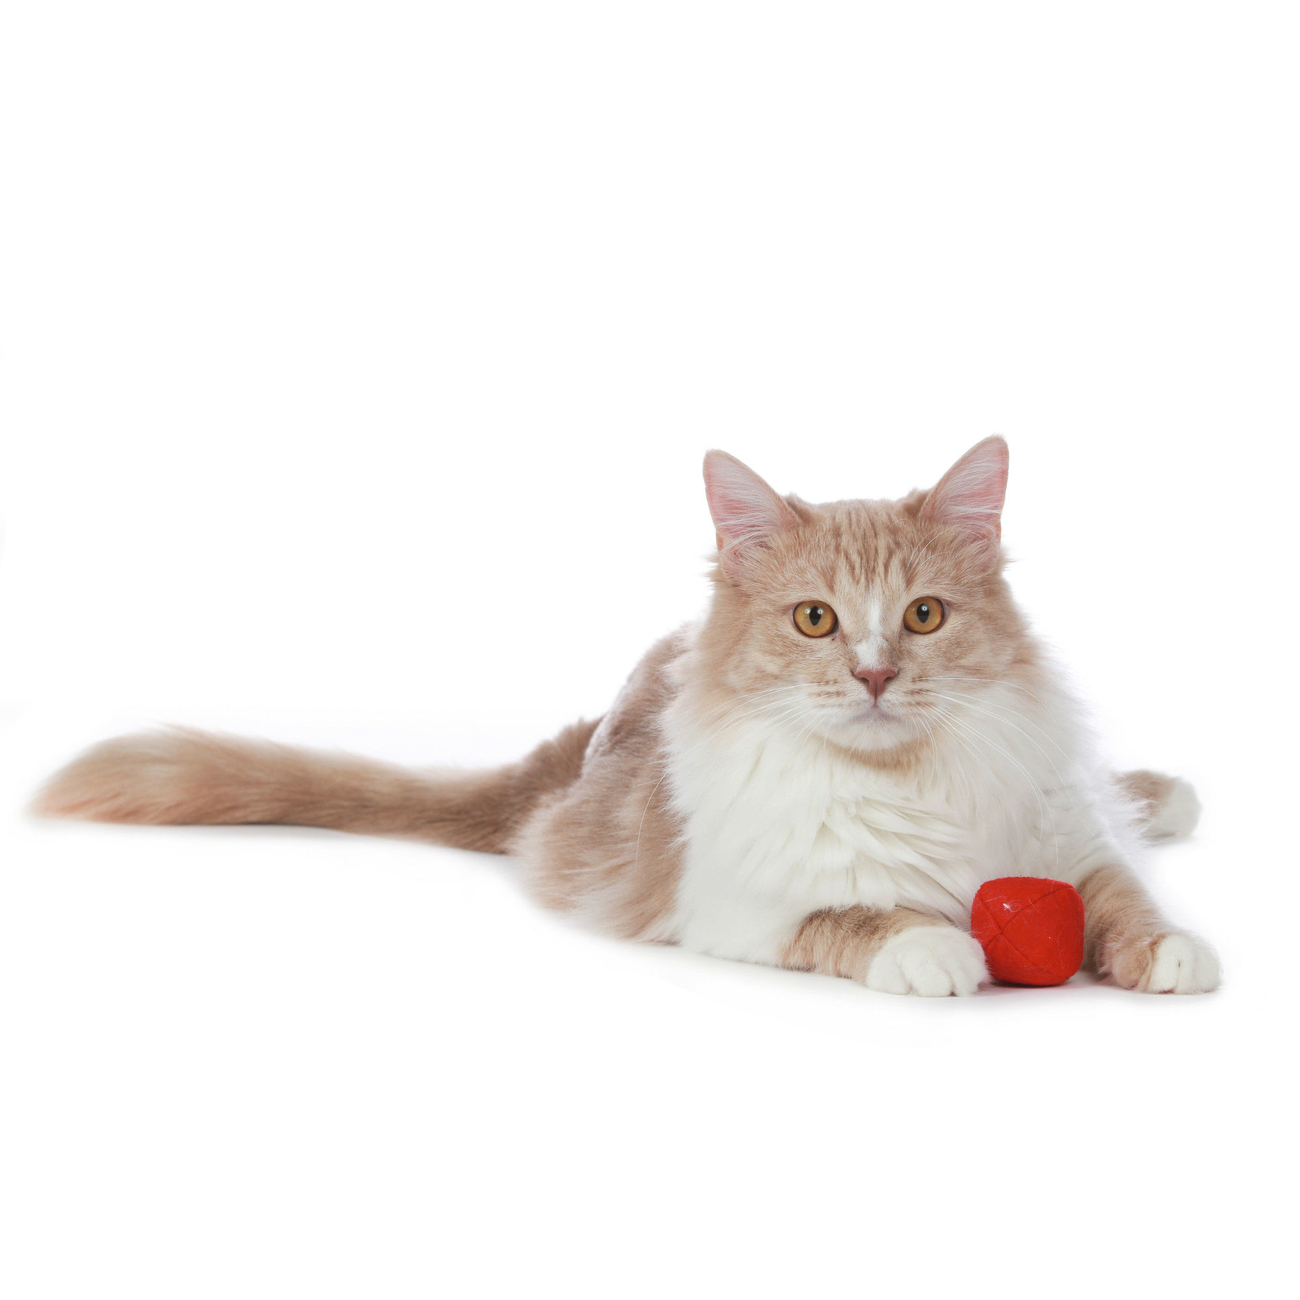 Hunter Katzenspielzeug by Laura 65902, Bild 11